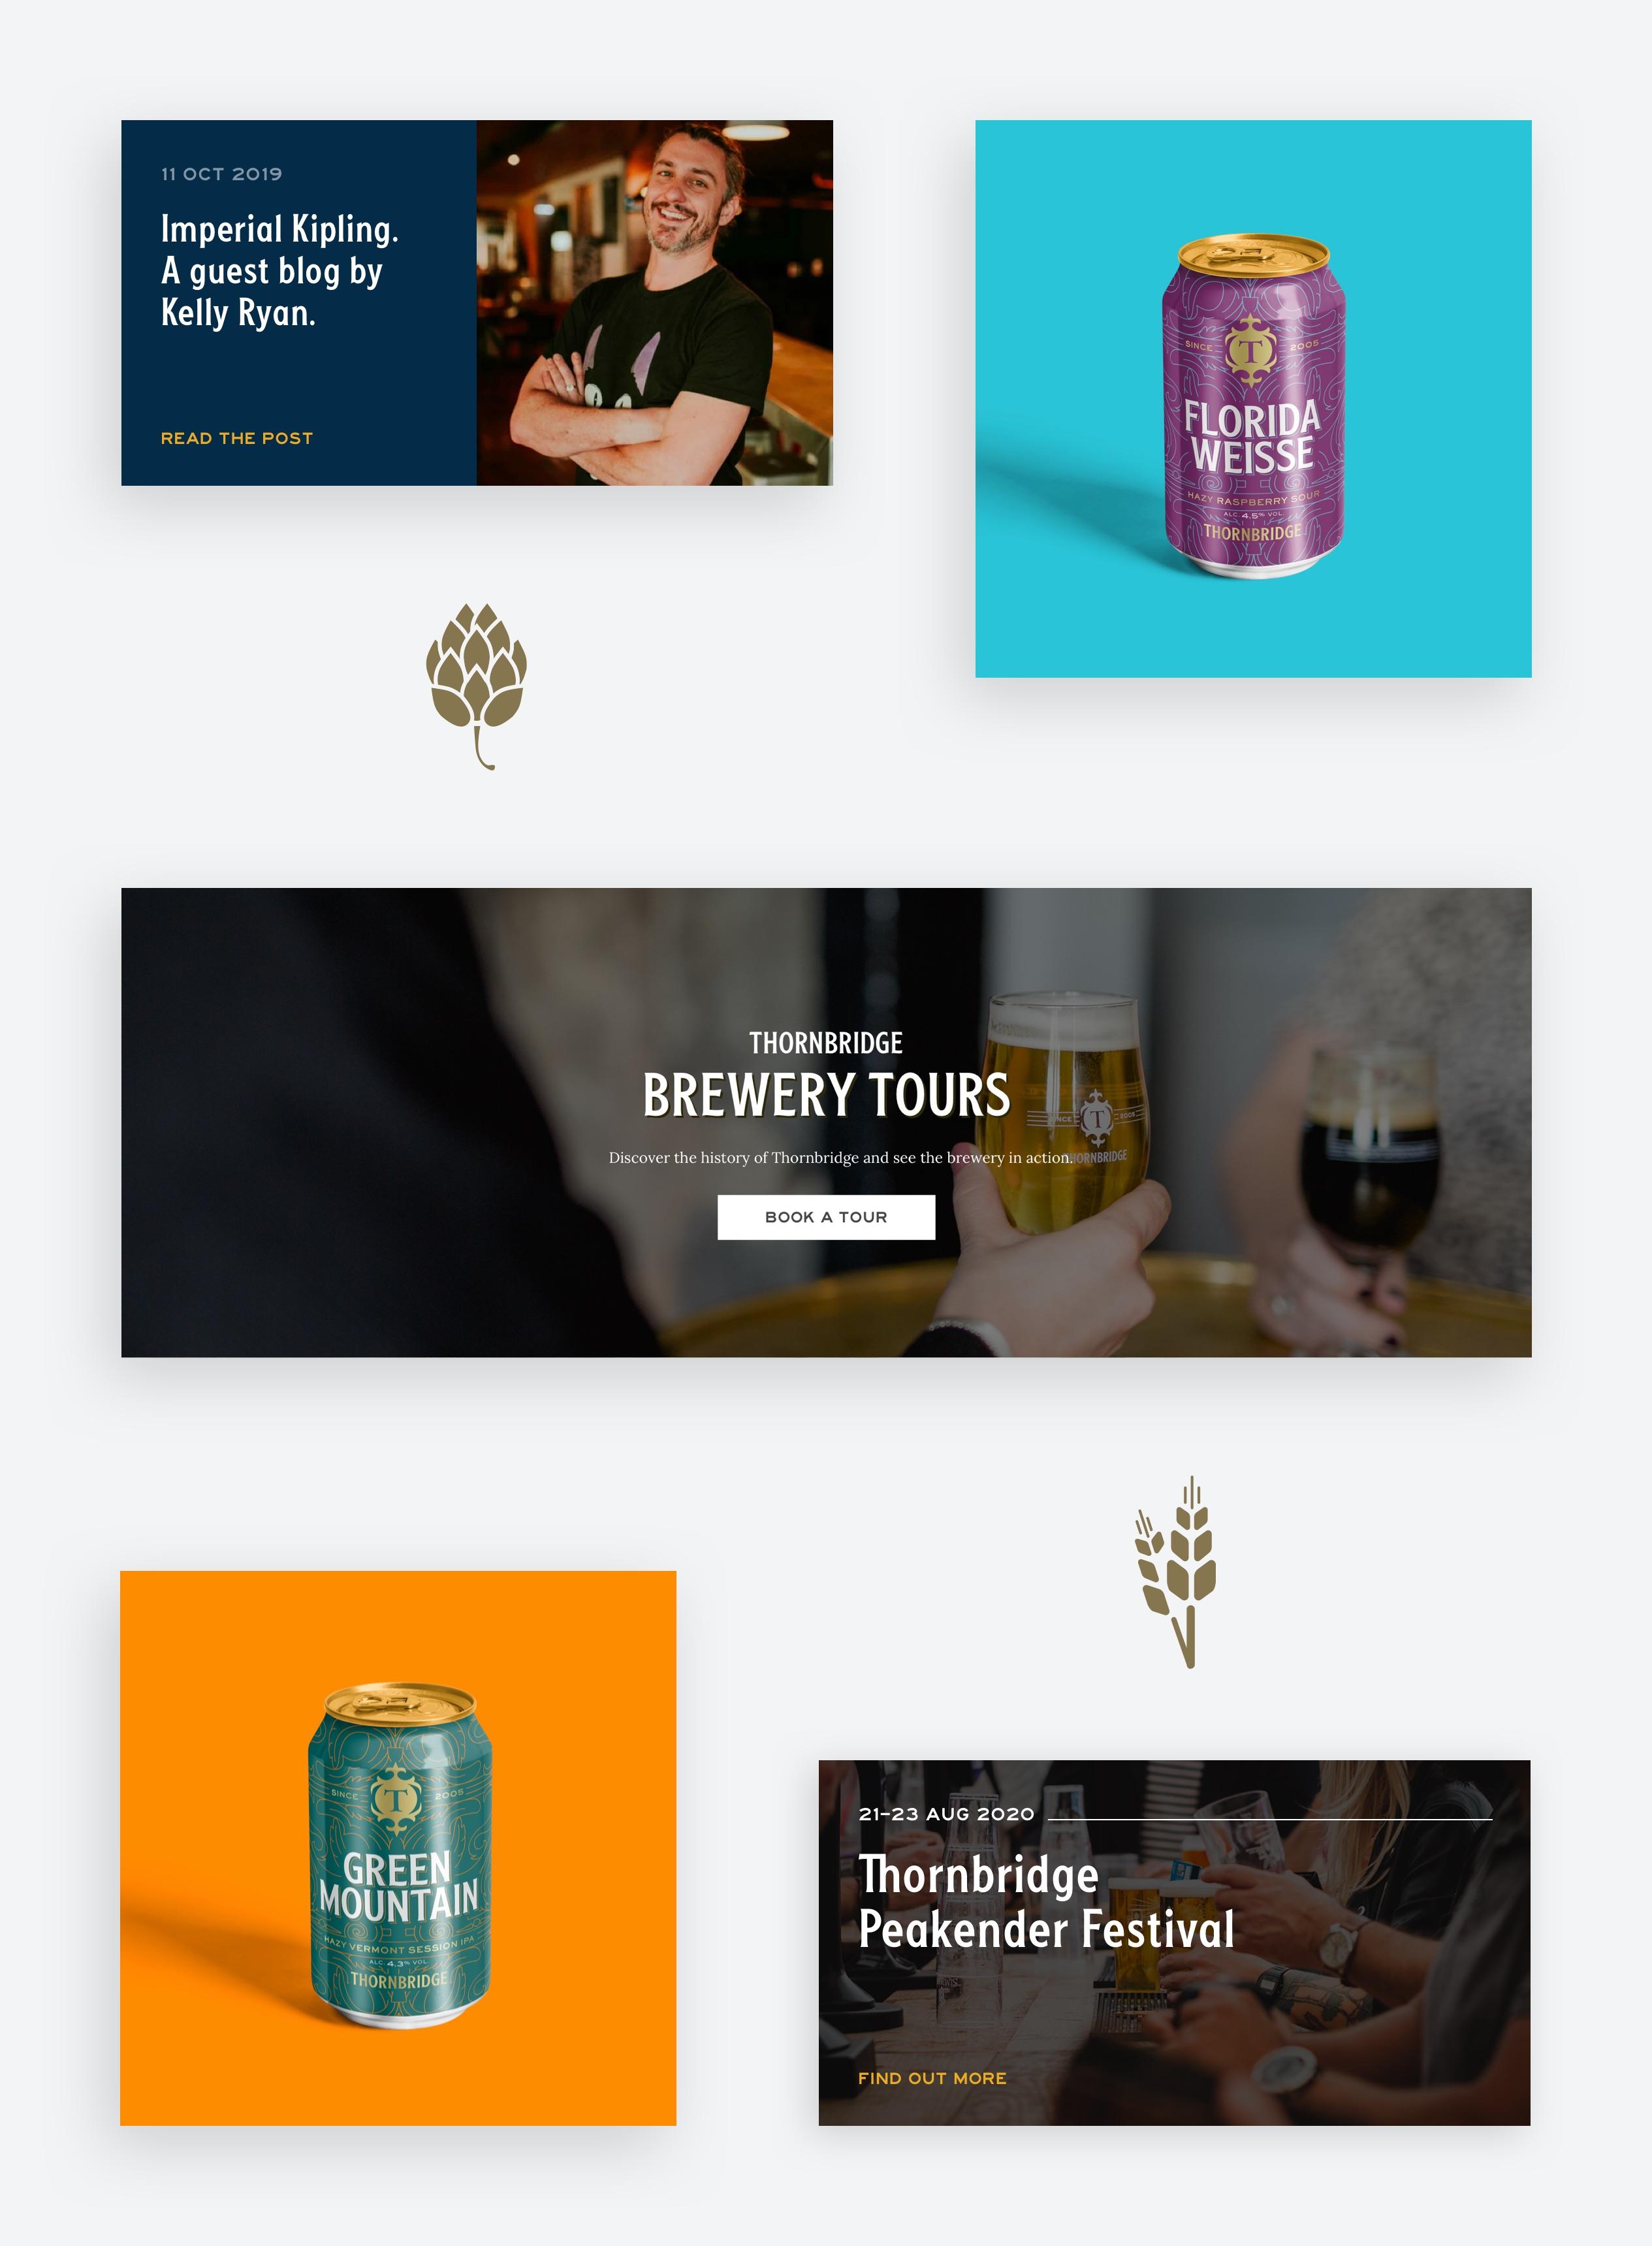 Thornbridge Brewery designs